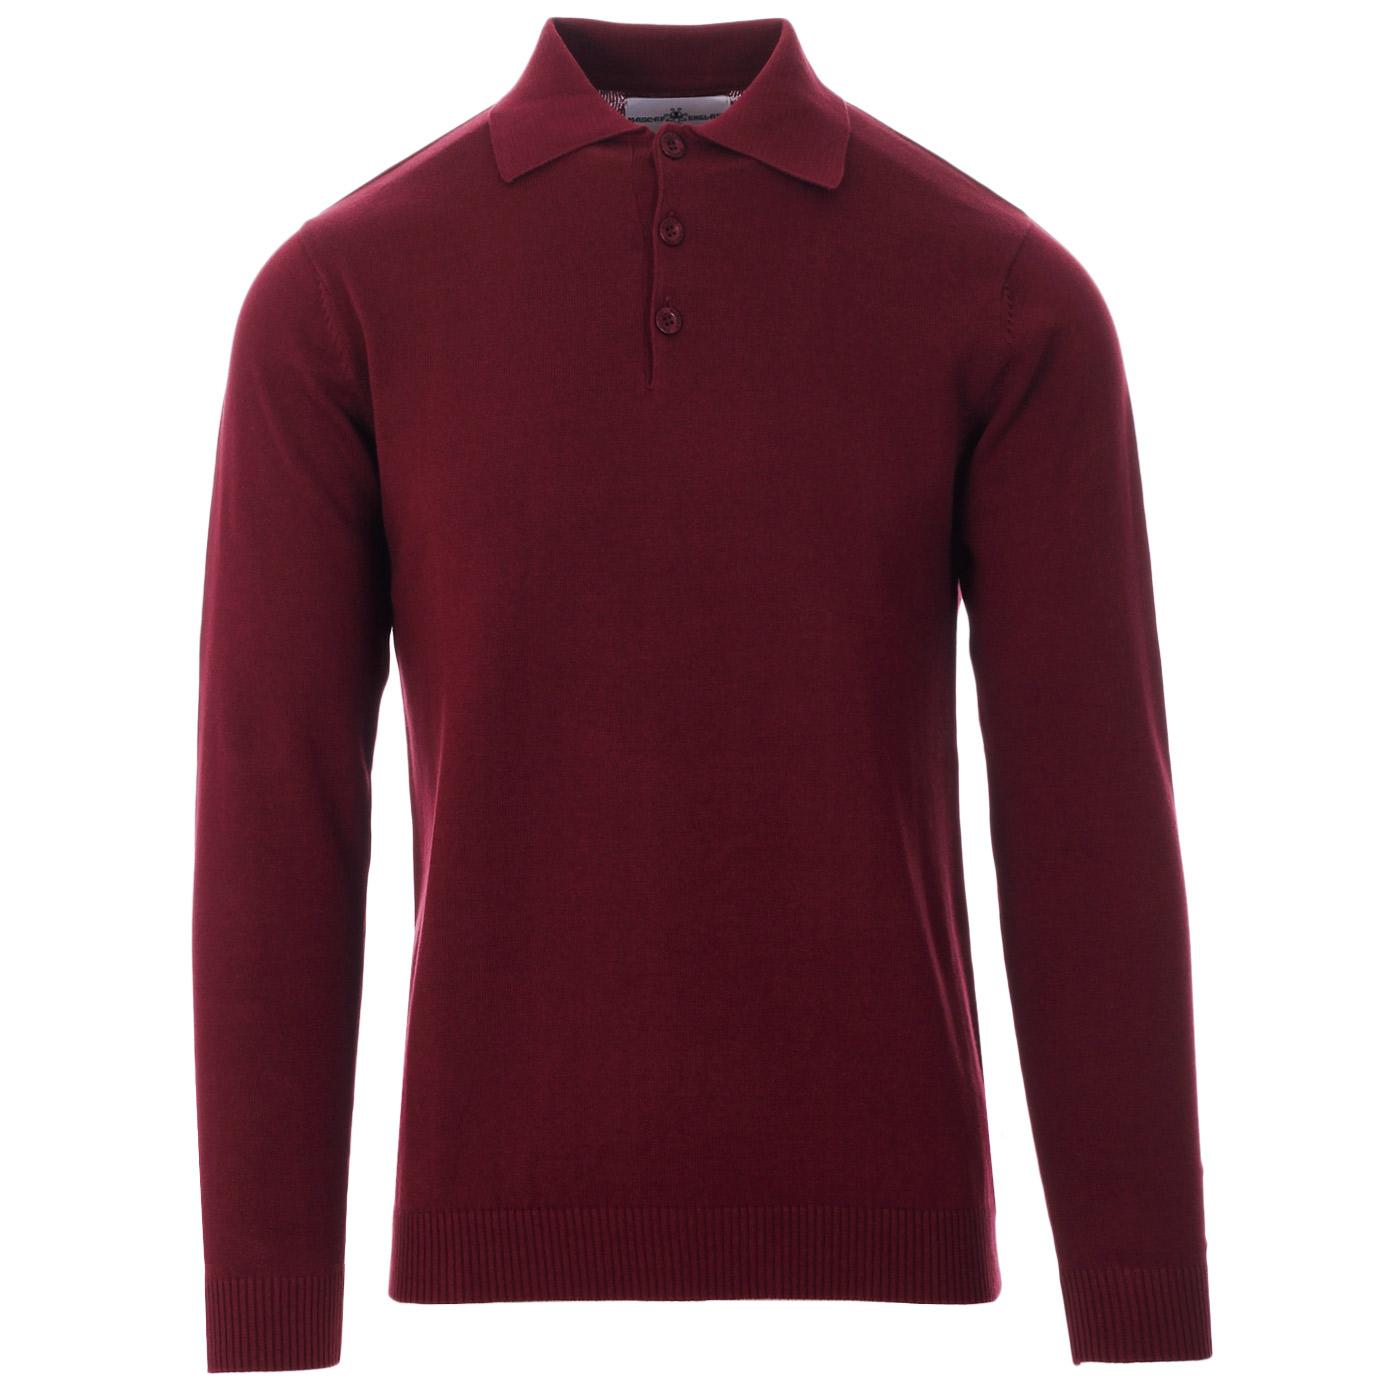 Brando MADCAP ENGLAND 1960s Mod Knitted Polo (Z)